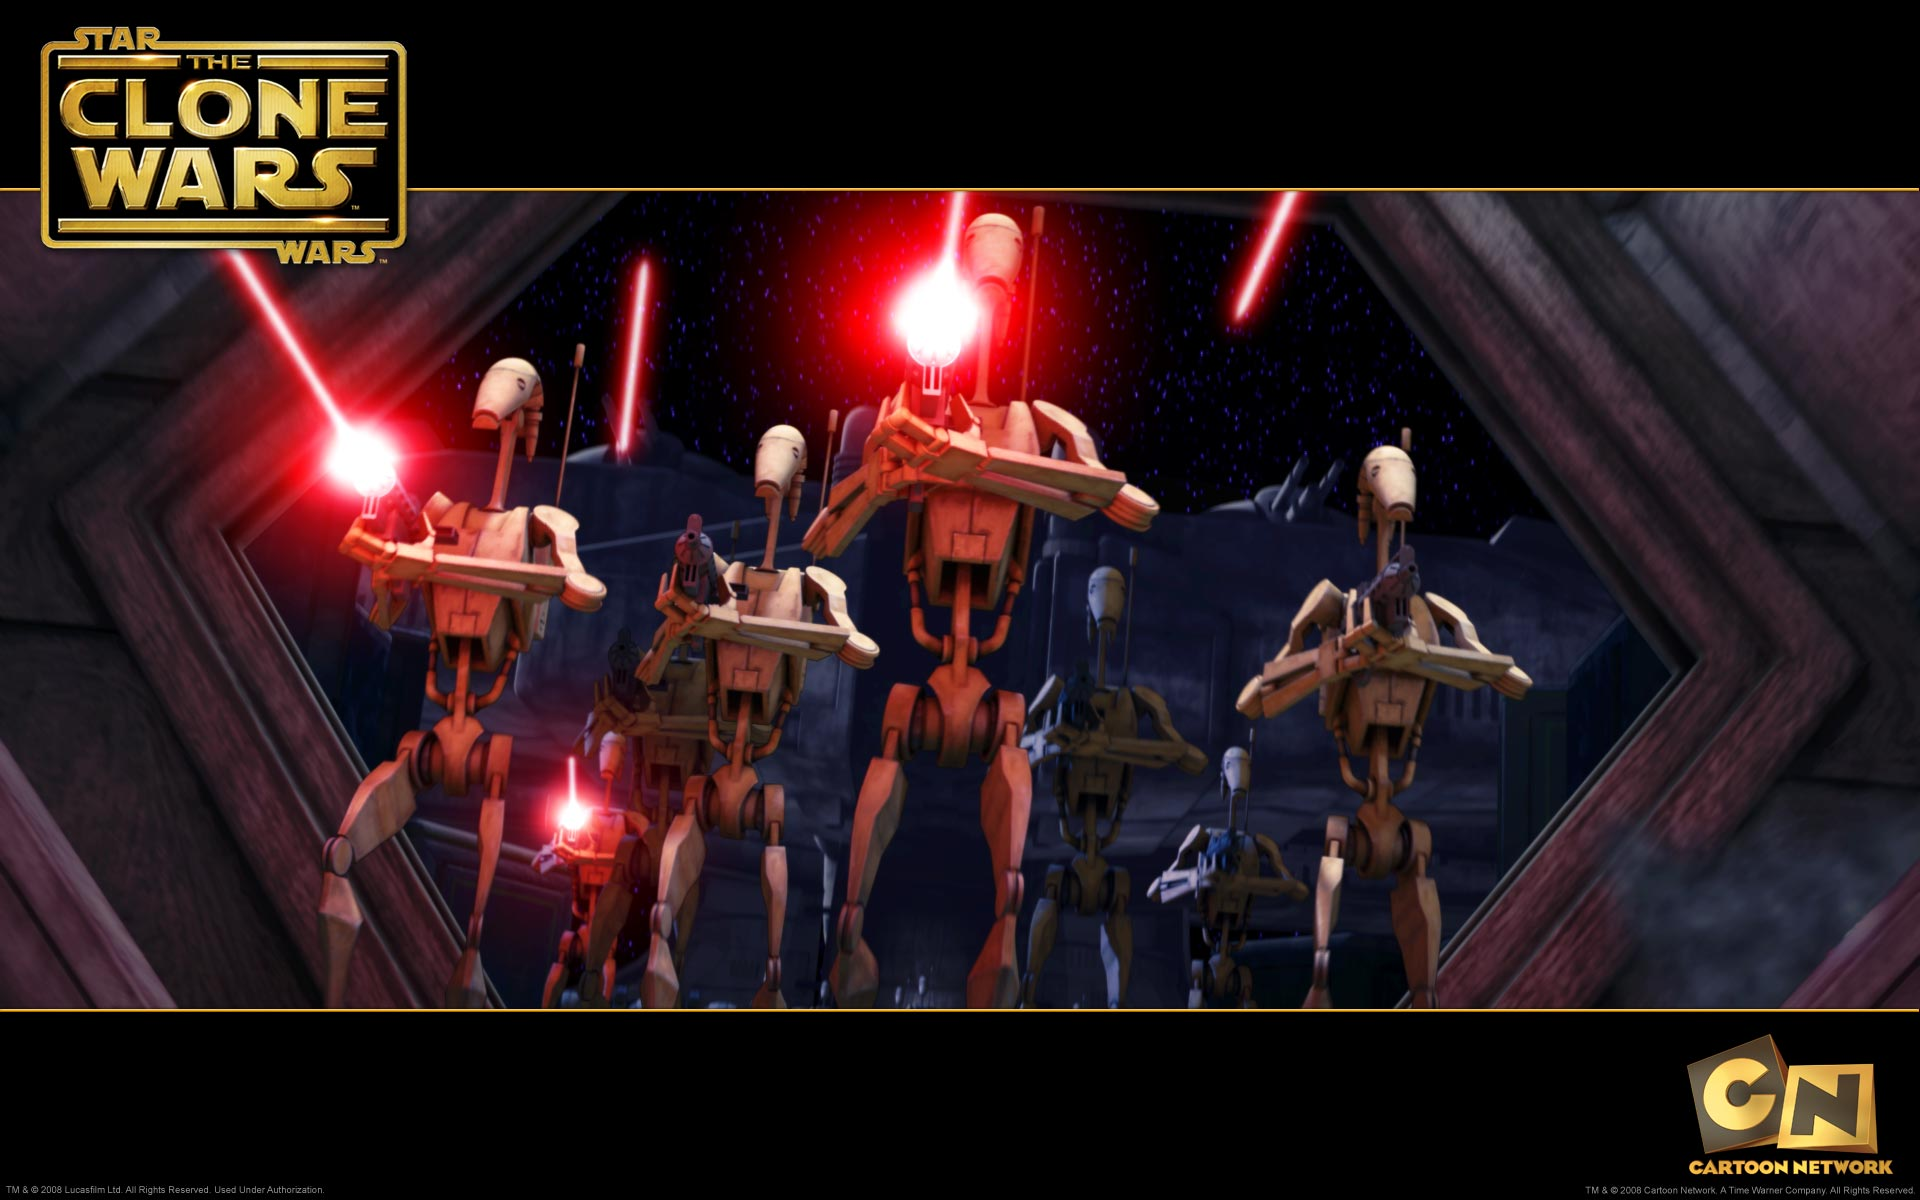 star wars the clone wars battle droid wallpaper